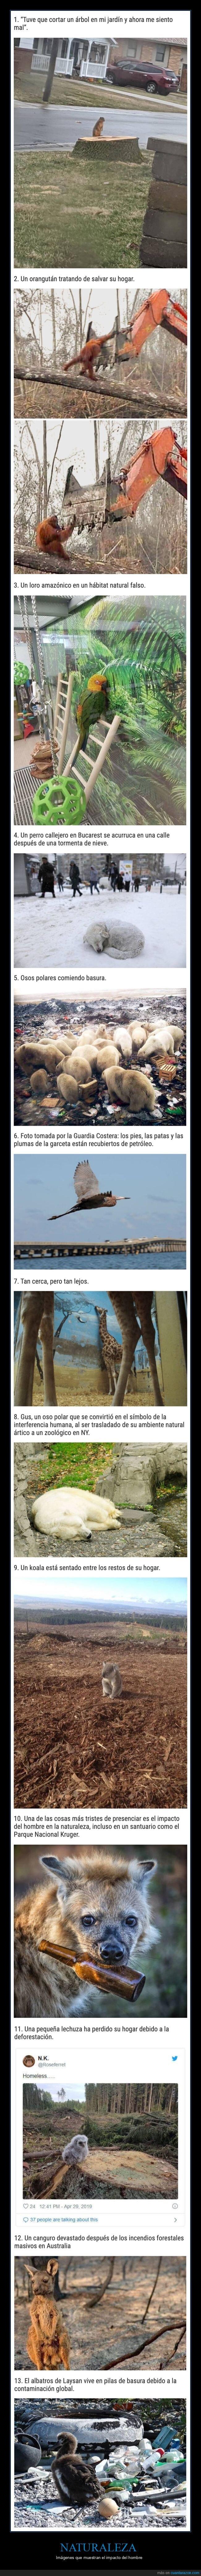 animales,impacto del hombre,naturaleza